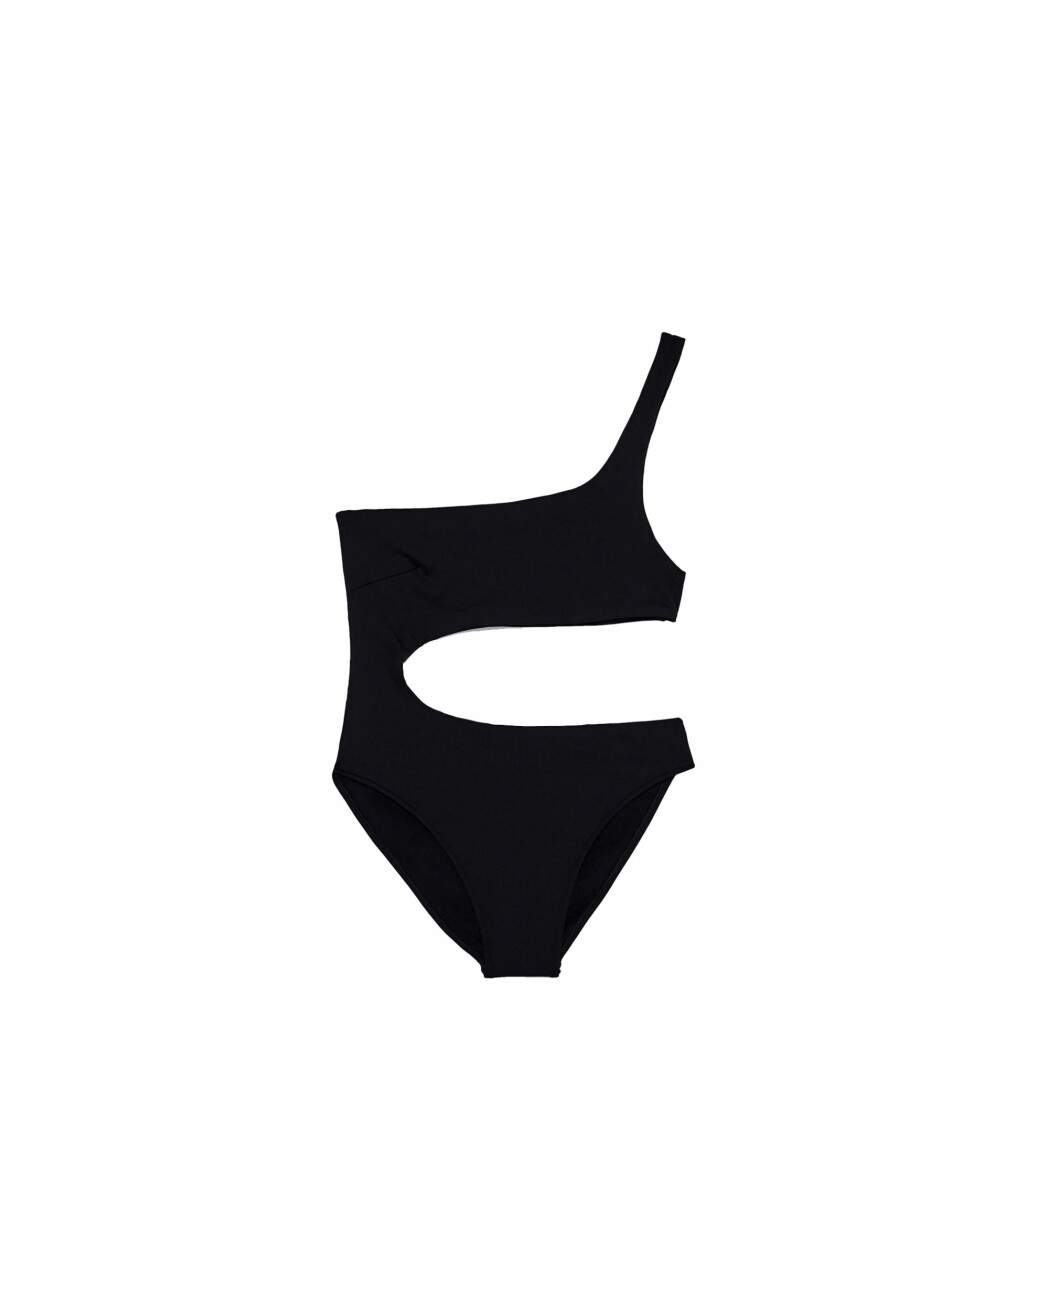 <strong>Badedrakt fra Zara | kr 249 | https:</strong>//www.zara.com/no/no/dame/swimwear-collection/asymmetrisk-badedrakt-c398505p4475558.html